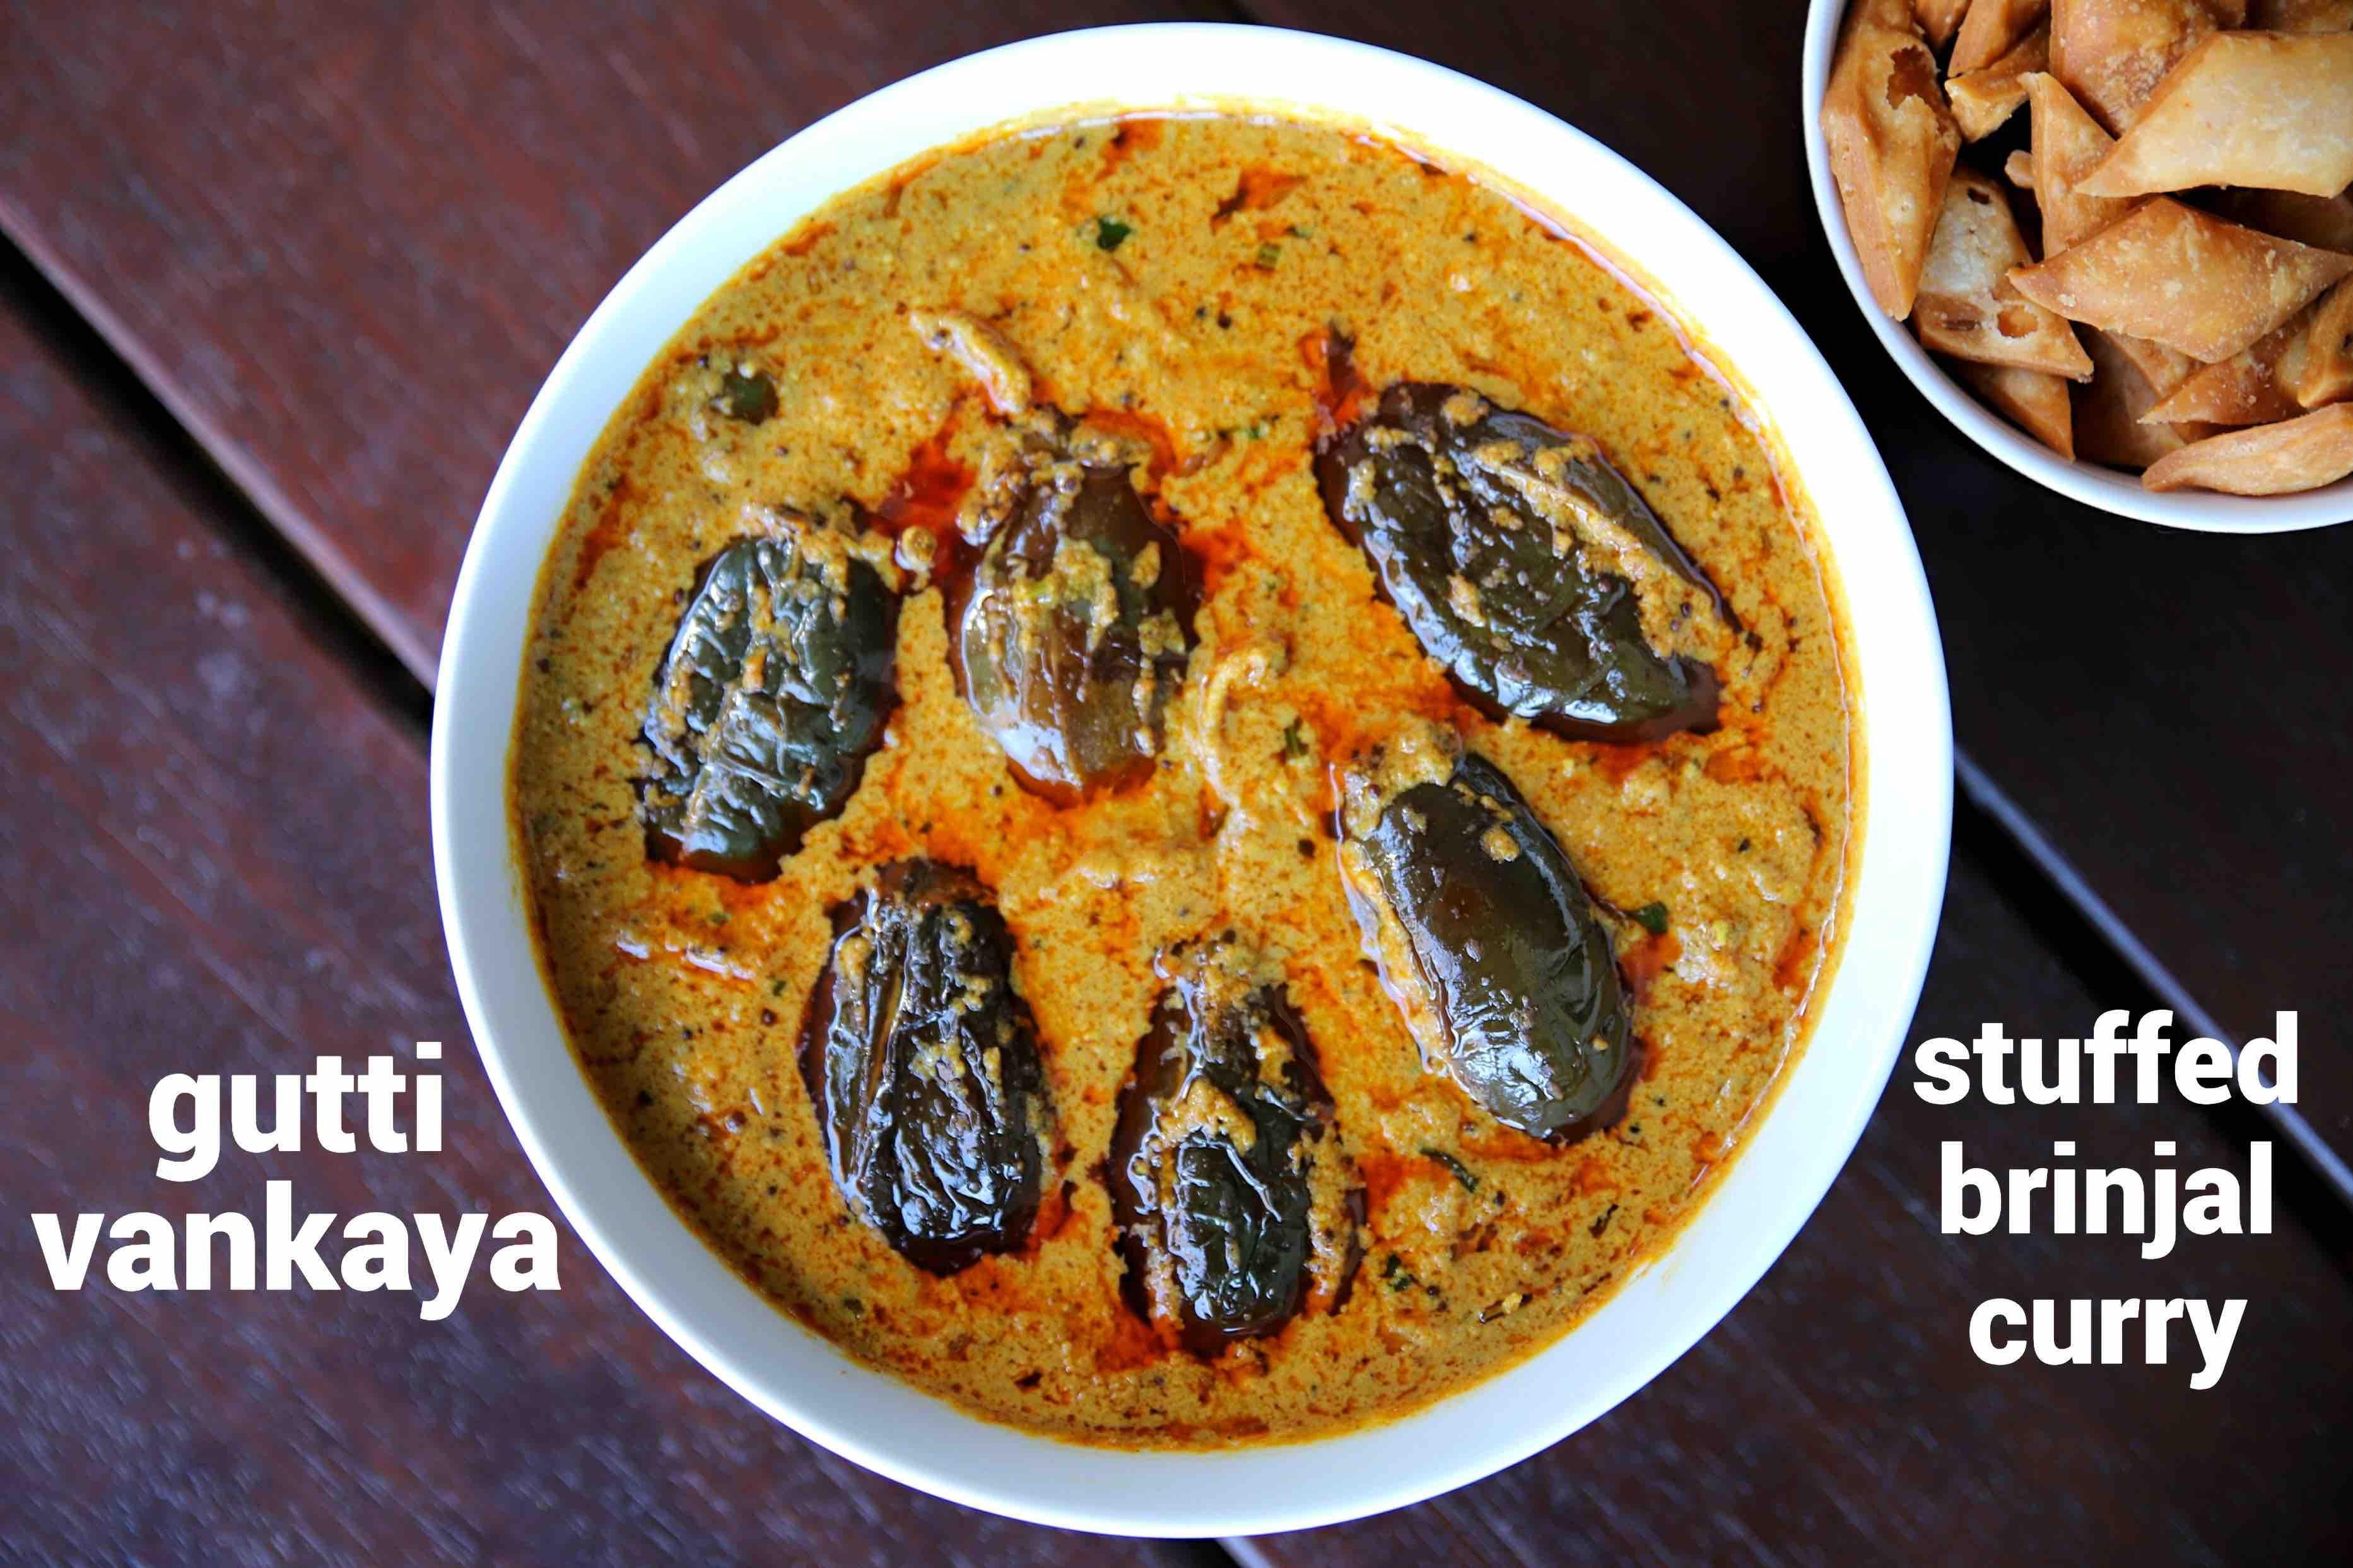 gutti vankaya curry recipe | stuffed brinjal curry | gutti vankaya kura